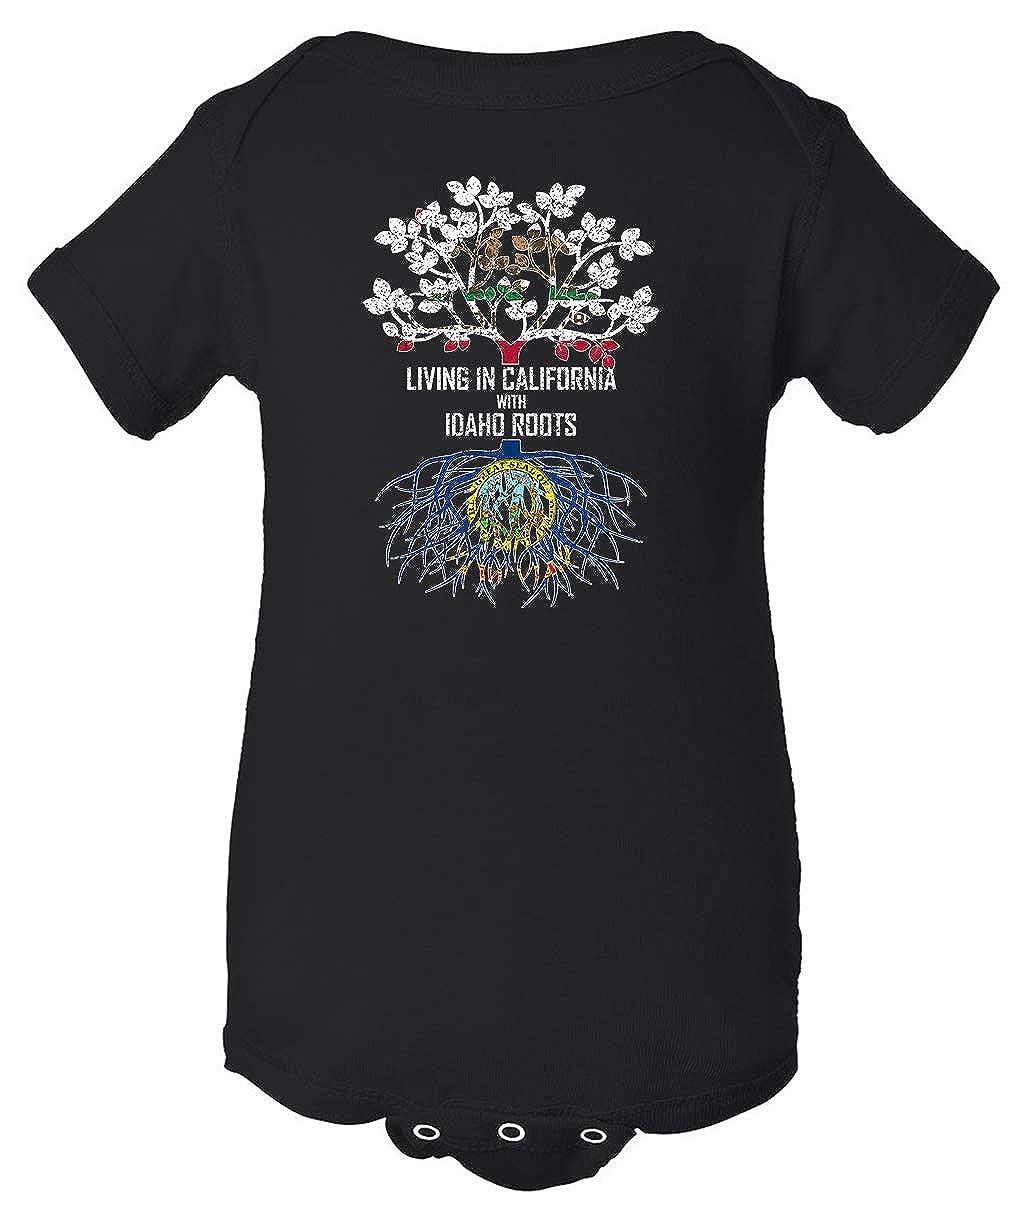 Tenacitee Babys Living in California with Idaho Roots Shirt